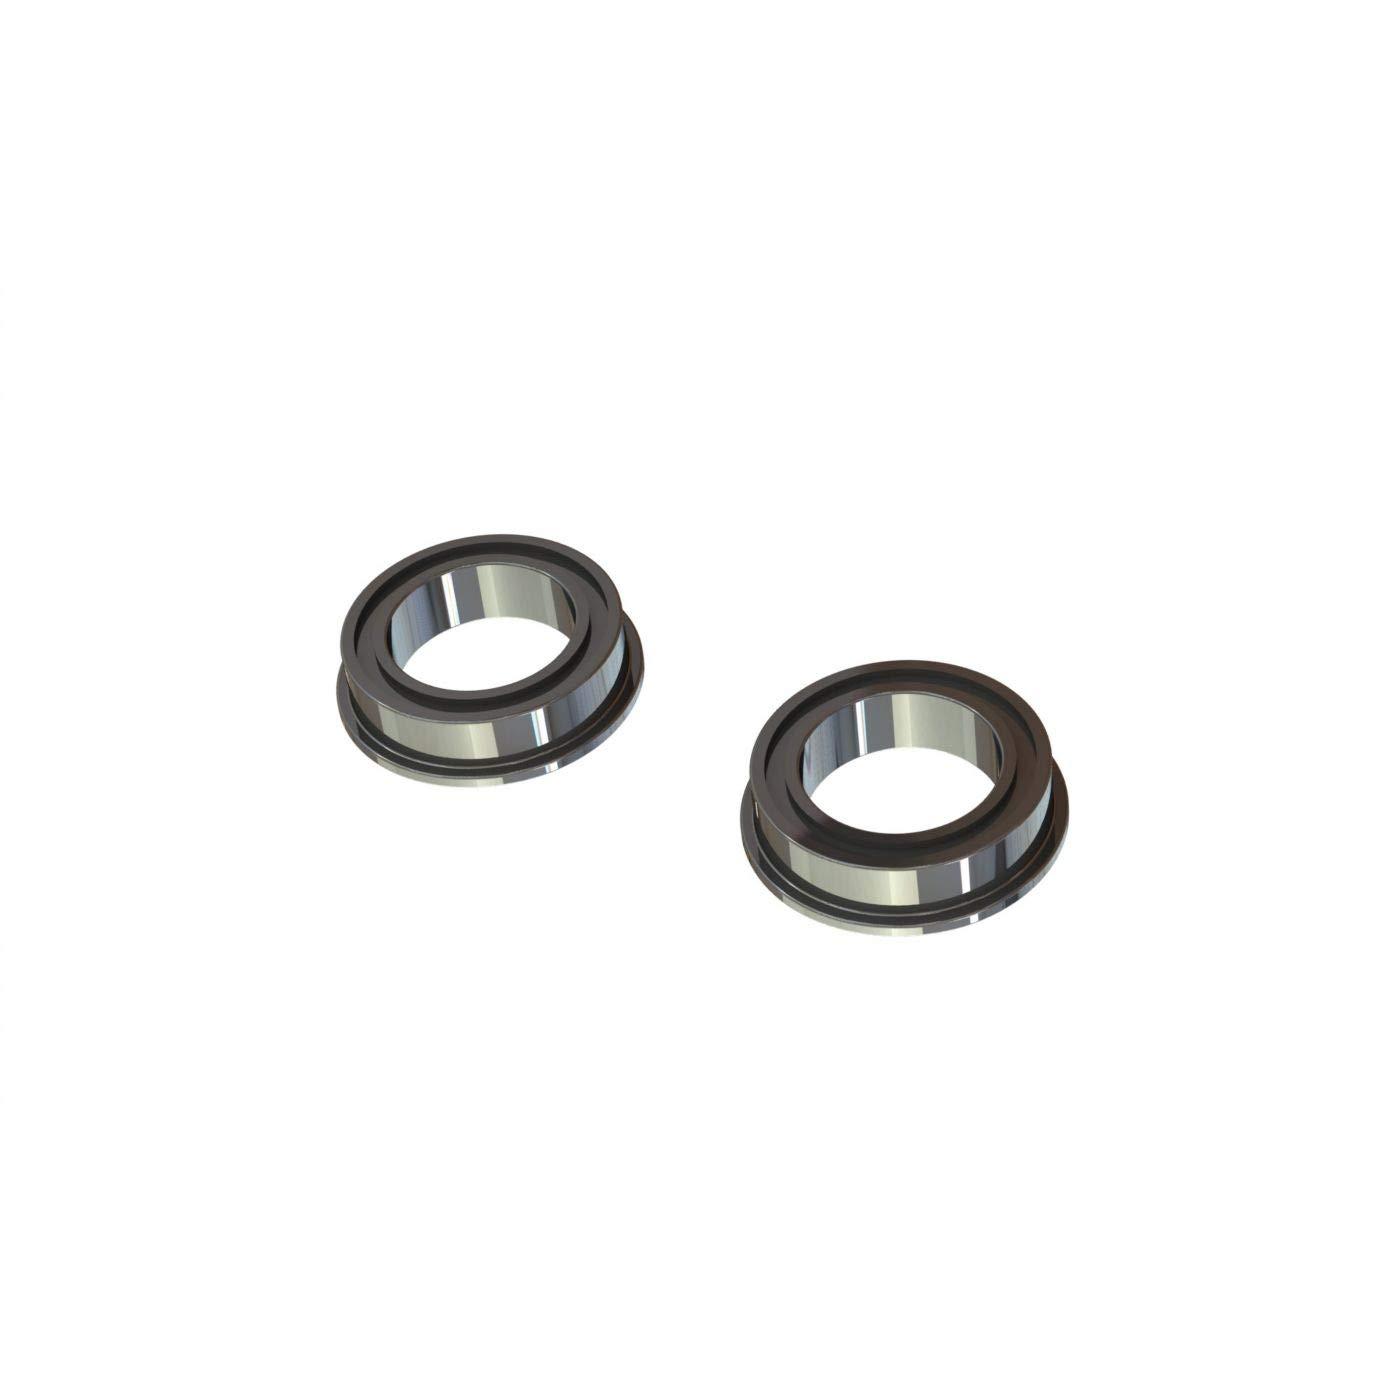 ARRMA Flange Ball Bearing ARA620003 10x15x4mm 2